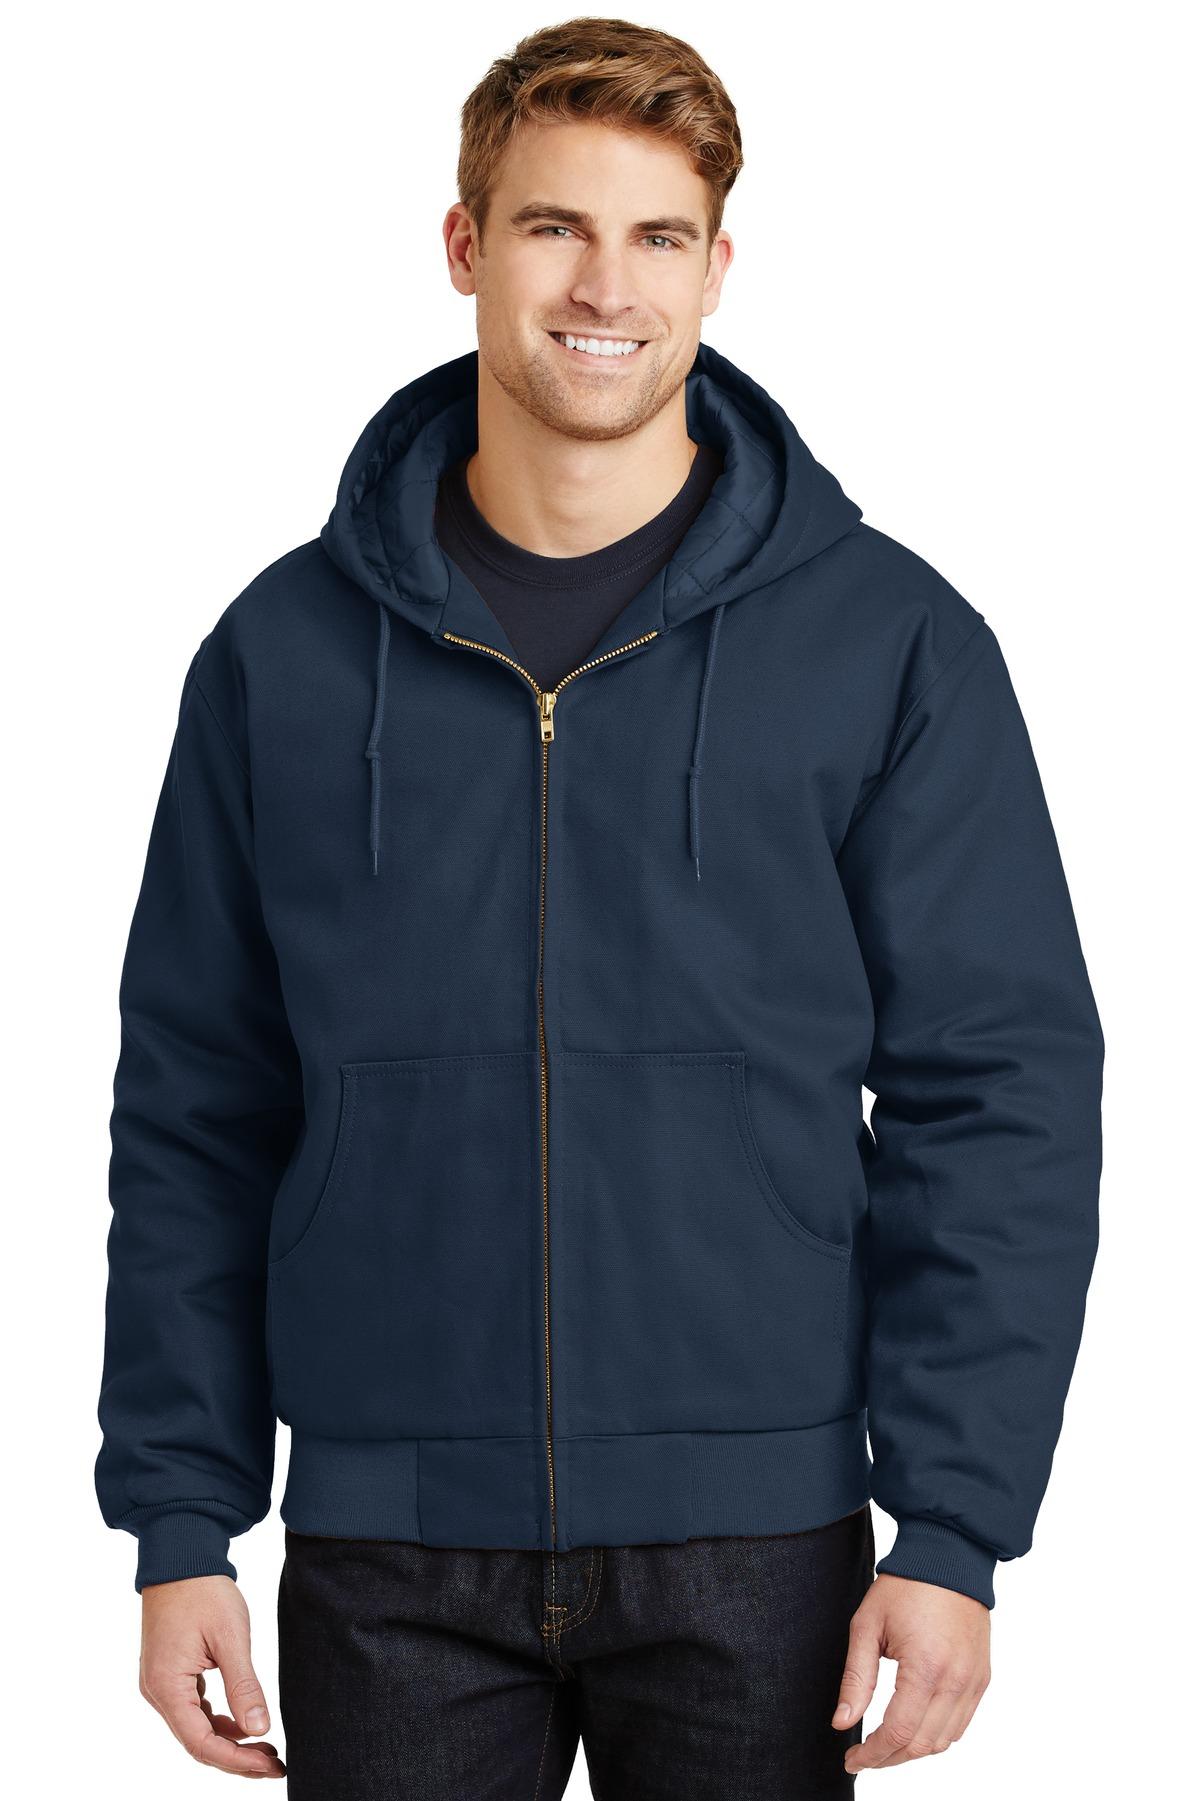 Cornerstone® - Duck Cloth Hooded Work Jacket. J763h Navy 6Xl f7022b7c0